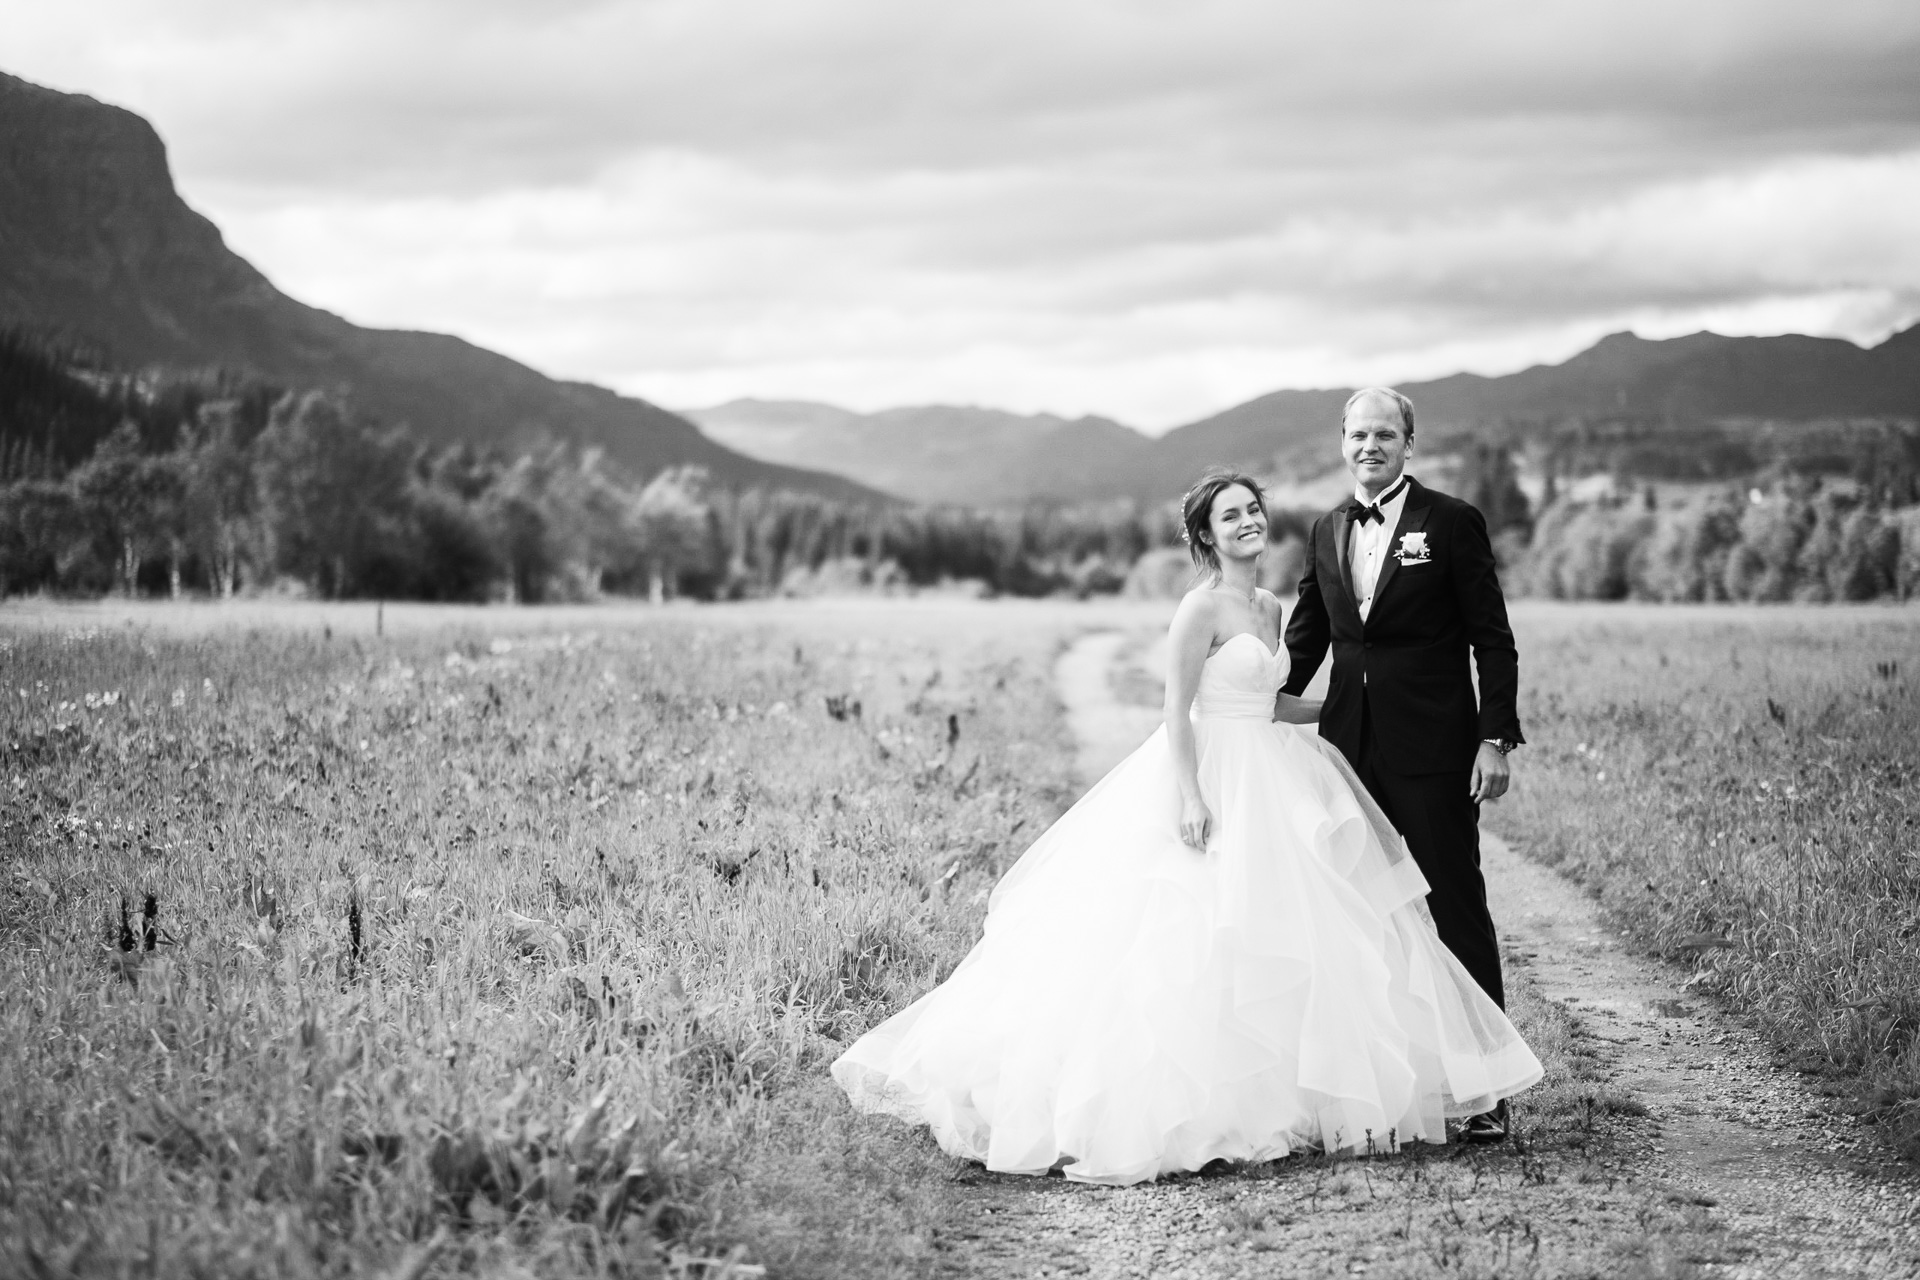 SebastianDahl-27-_DSF8563-bryllup Christina og Christian.jpg